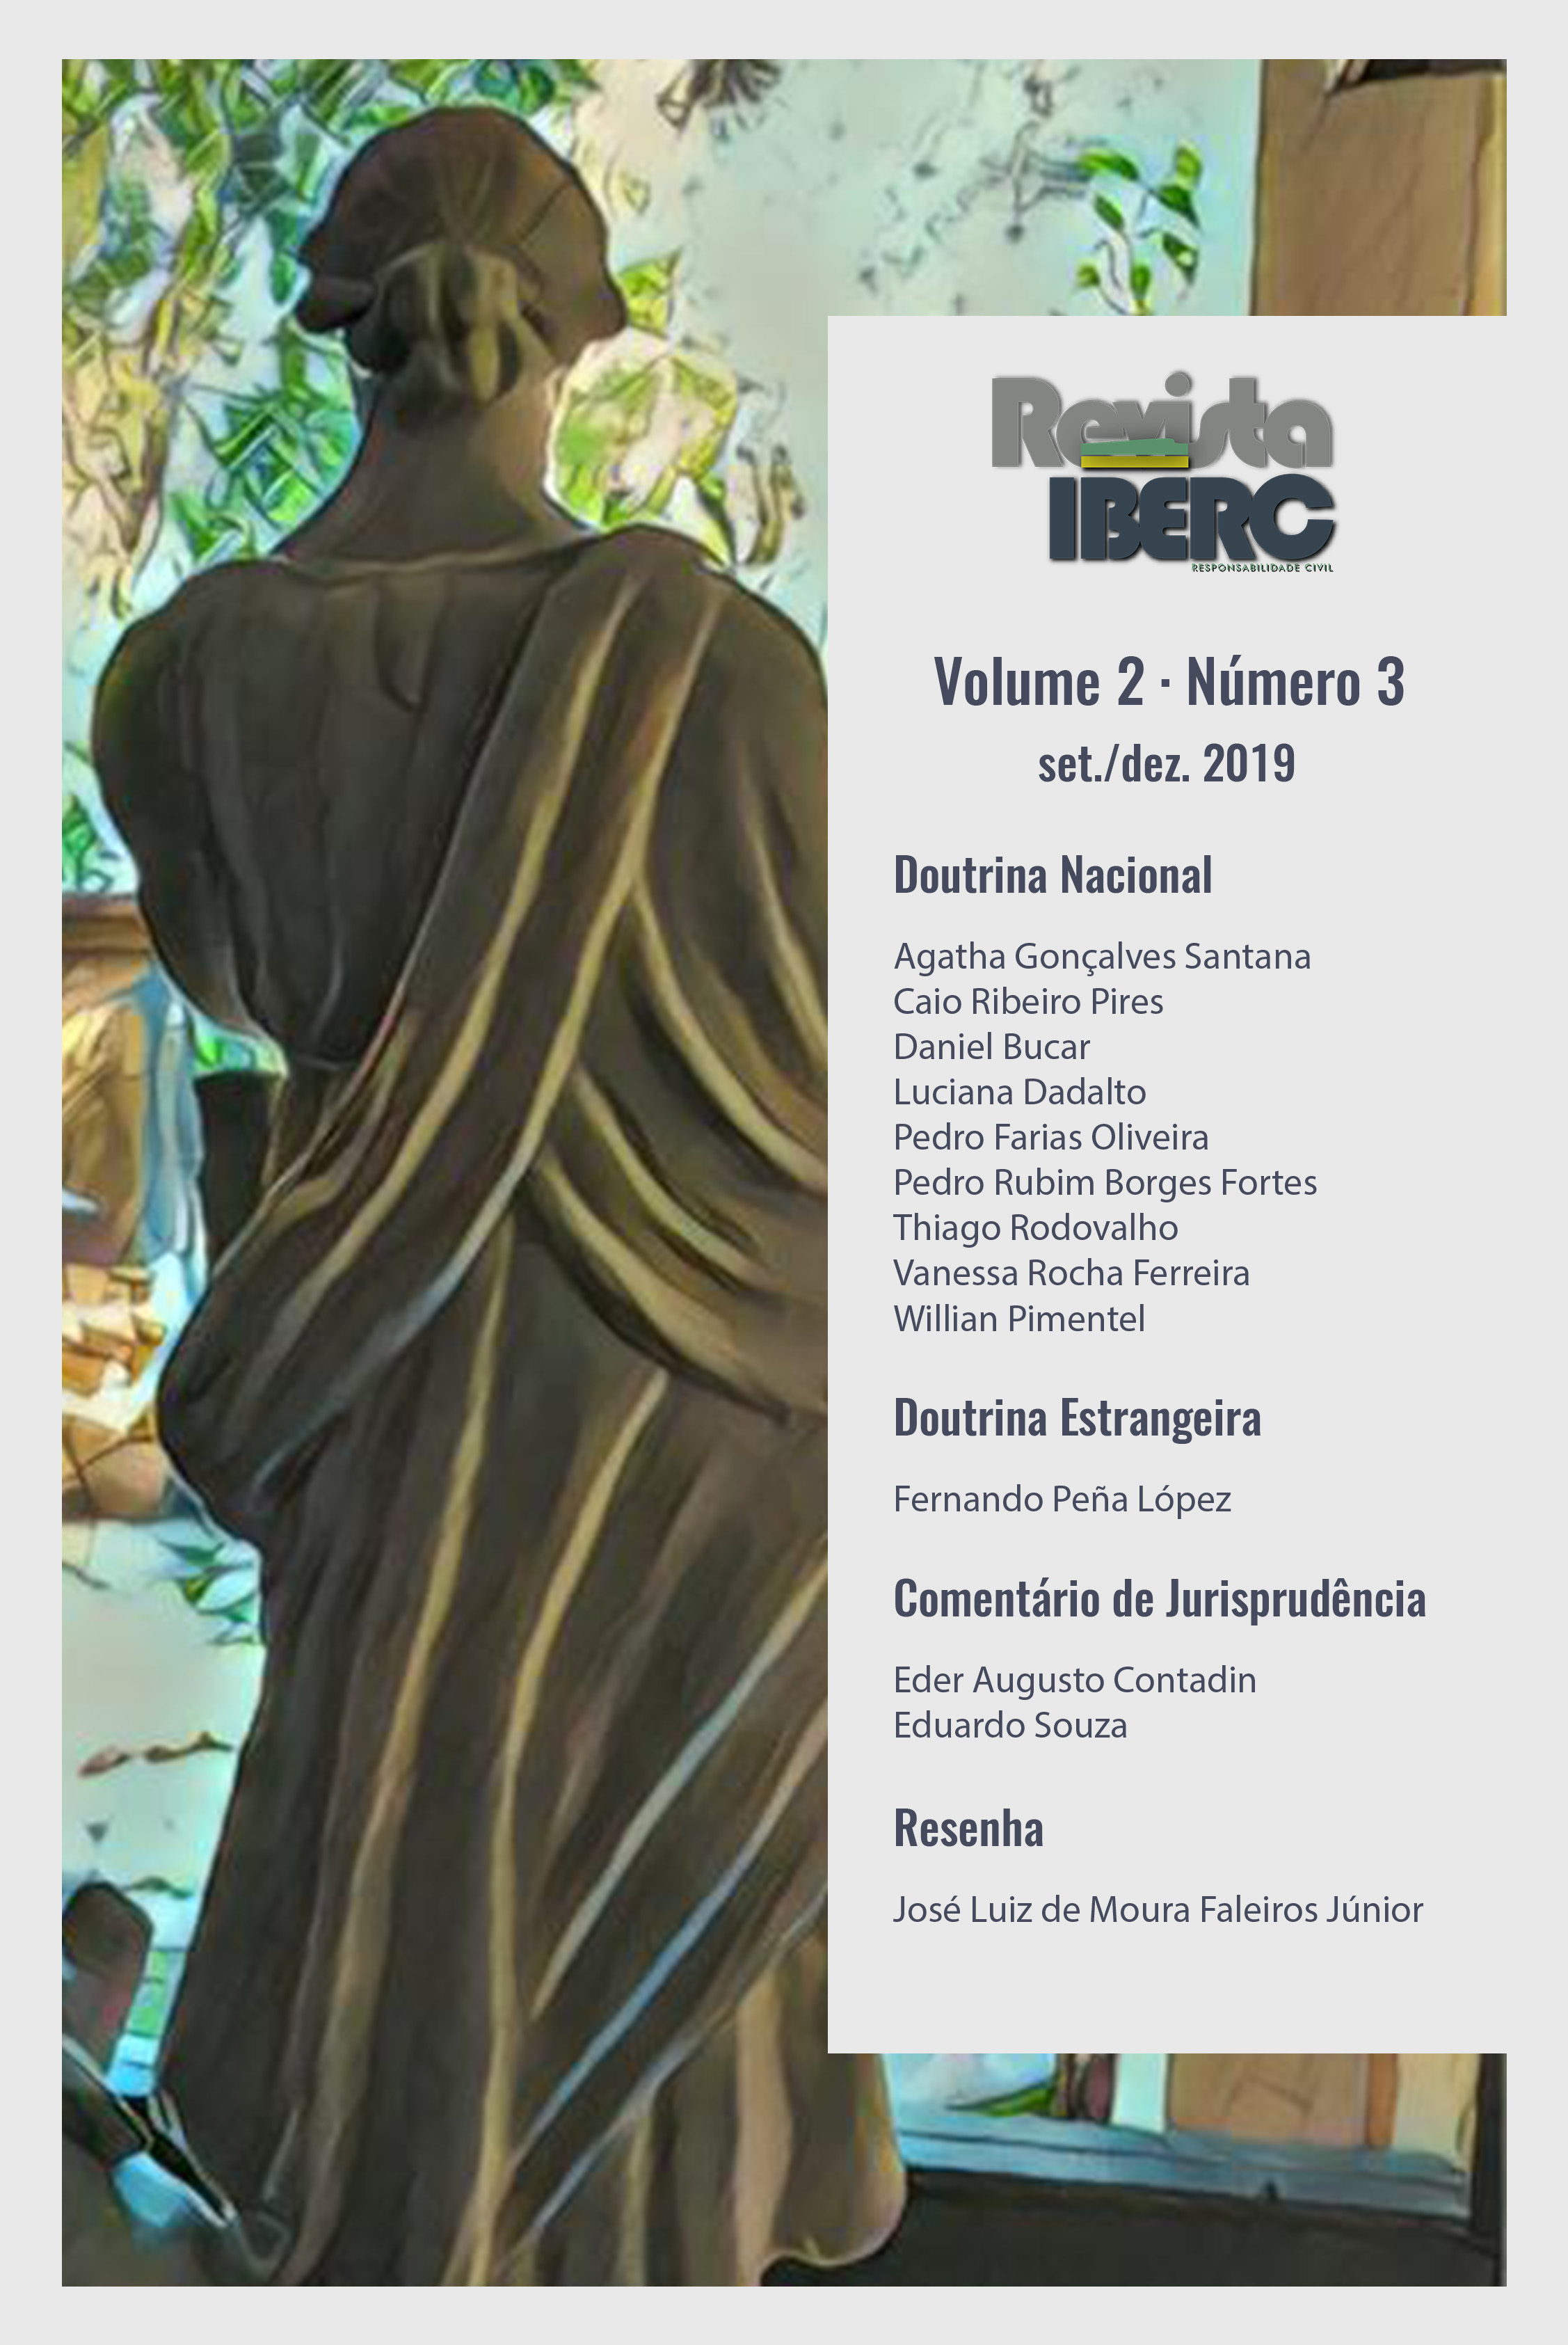 Capa da Revista IBERC - Volume 2 - Número 3